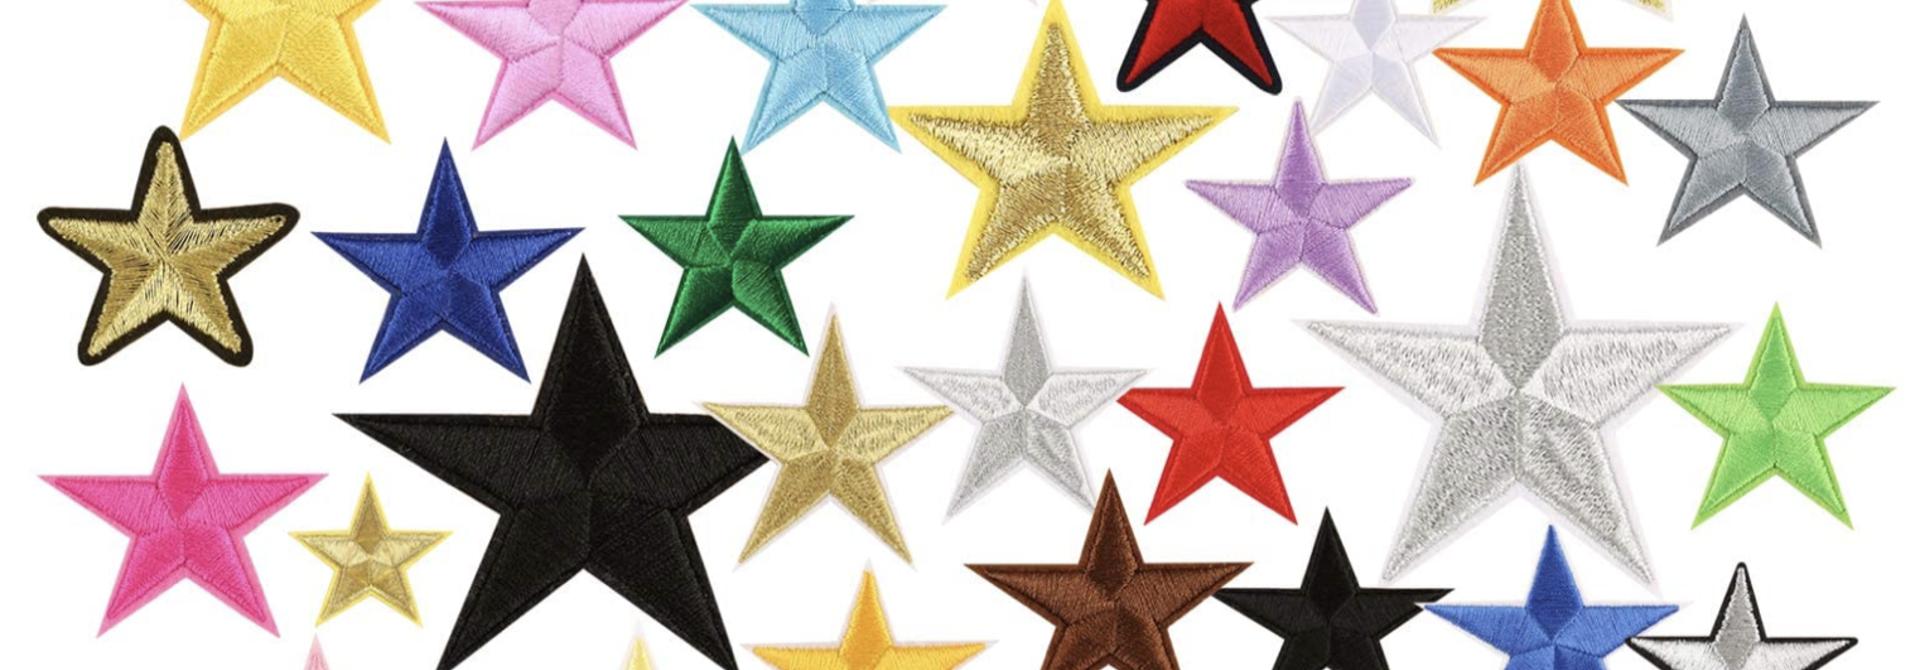 THE SHOP MEDIUM STAR PATCH